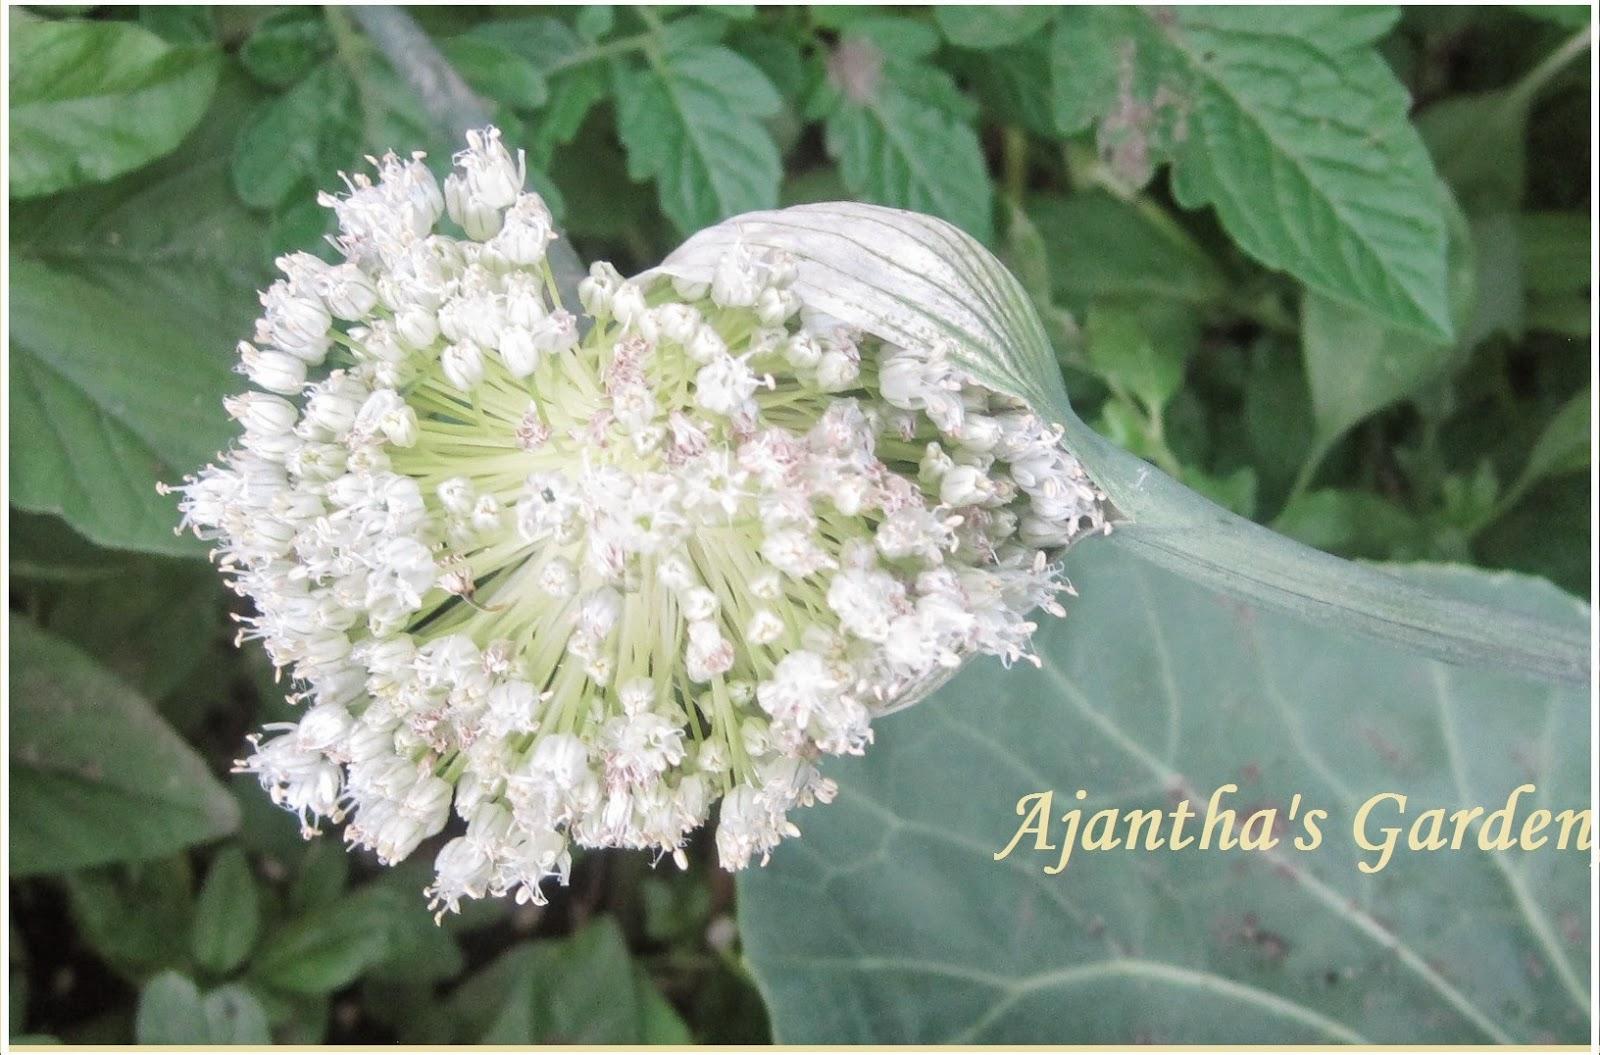 Ajantha's Garden/Leek flower